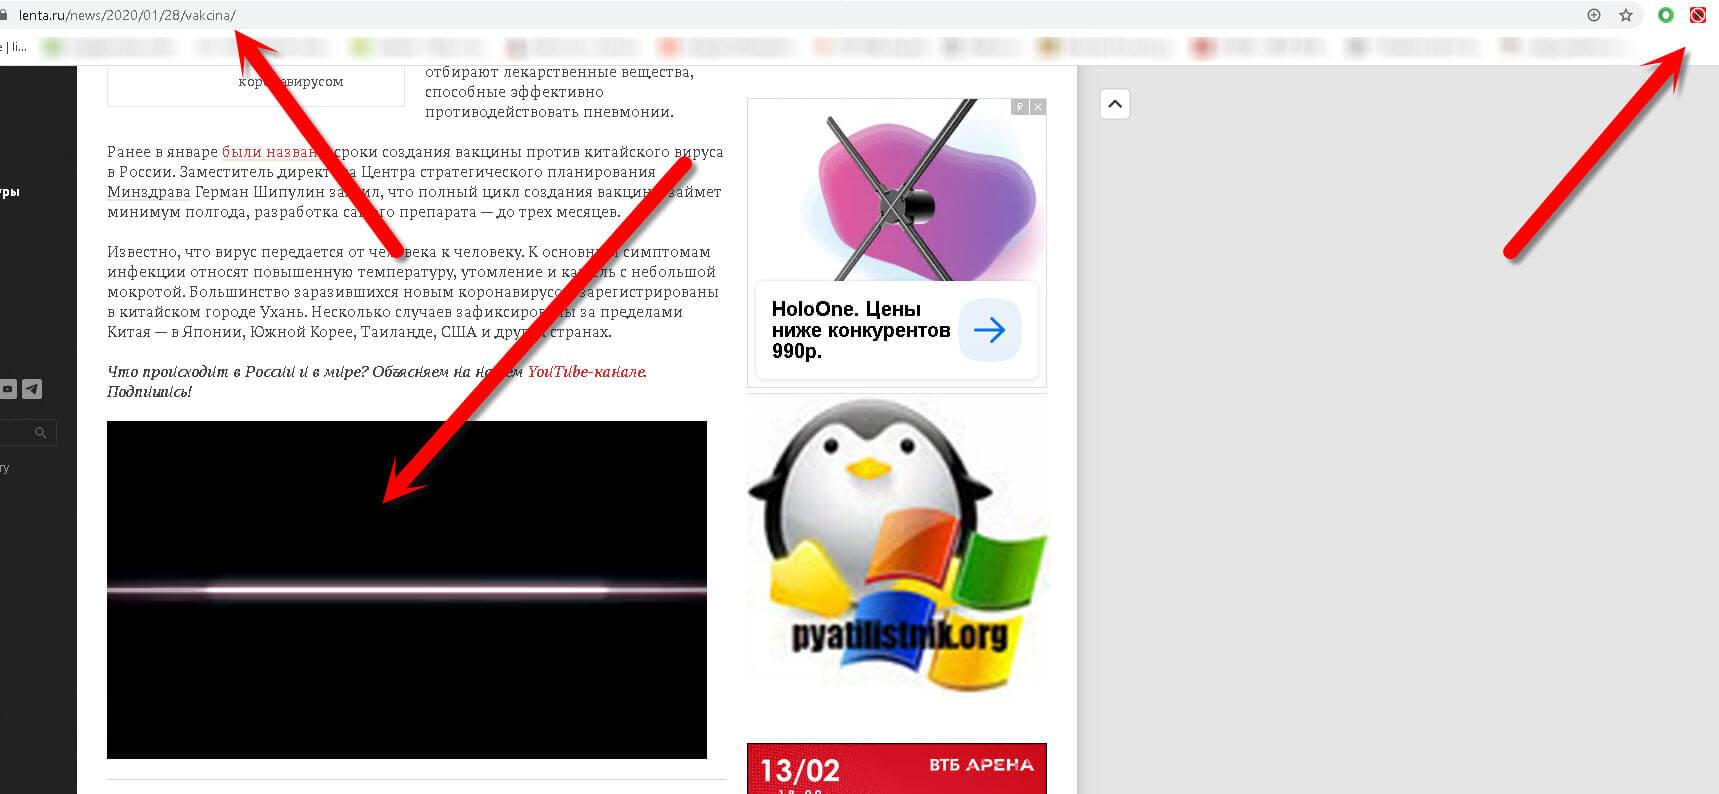 Блокировка автозапуска видео в Disable HTML5 Autoplay-01